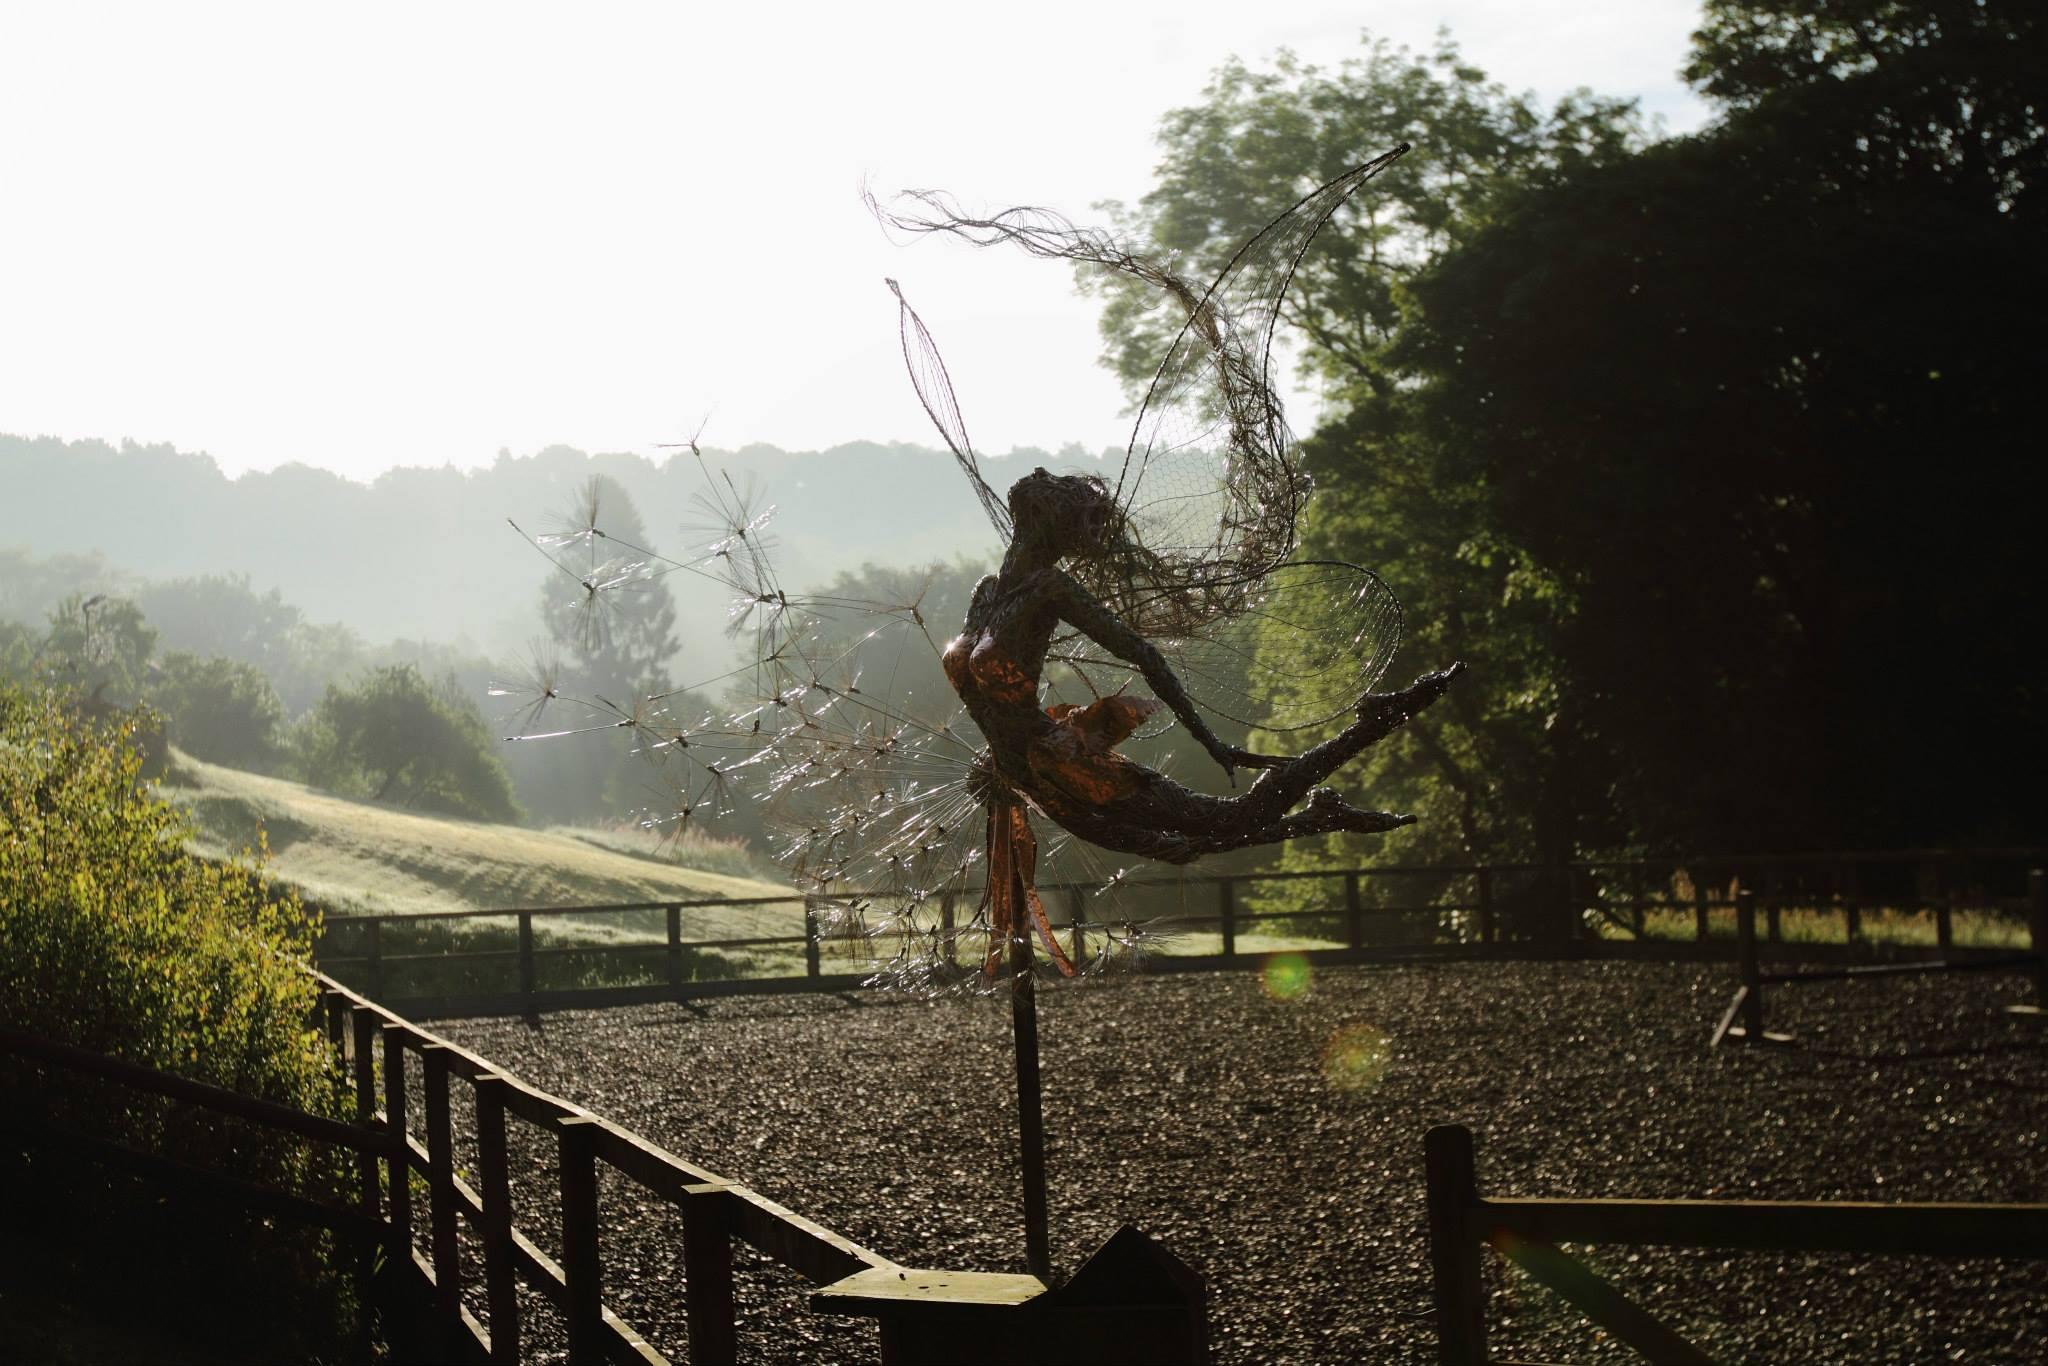 esculturas-fantasticas-de-robin-wight-08